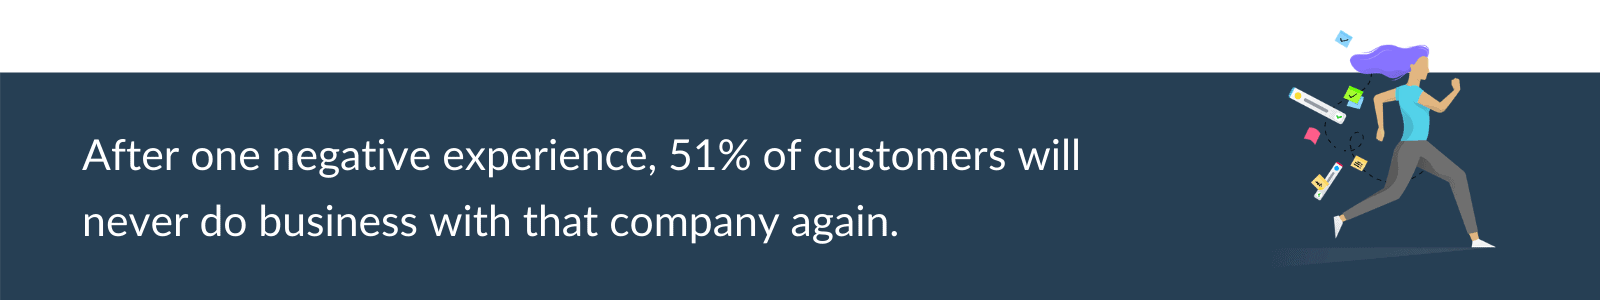 Construction customer service statistic #2